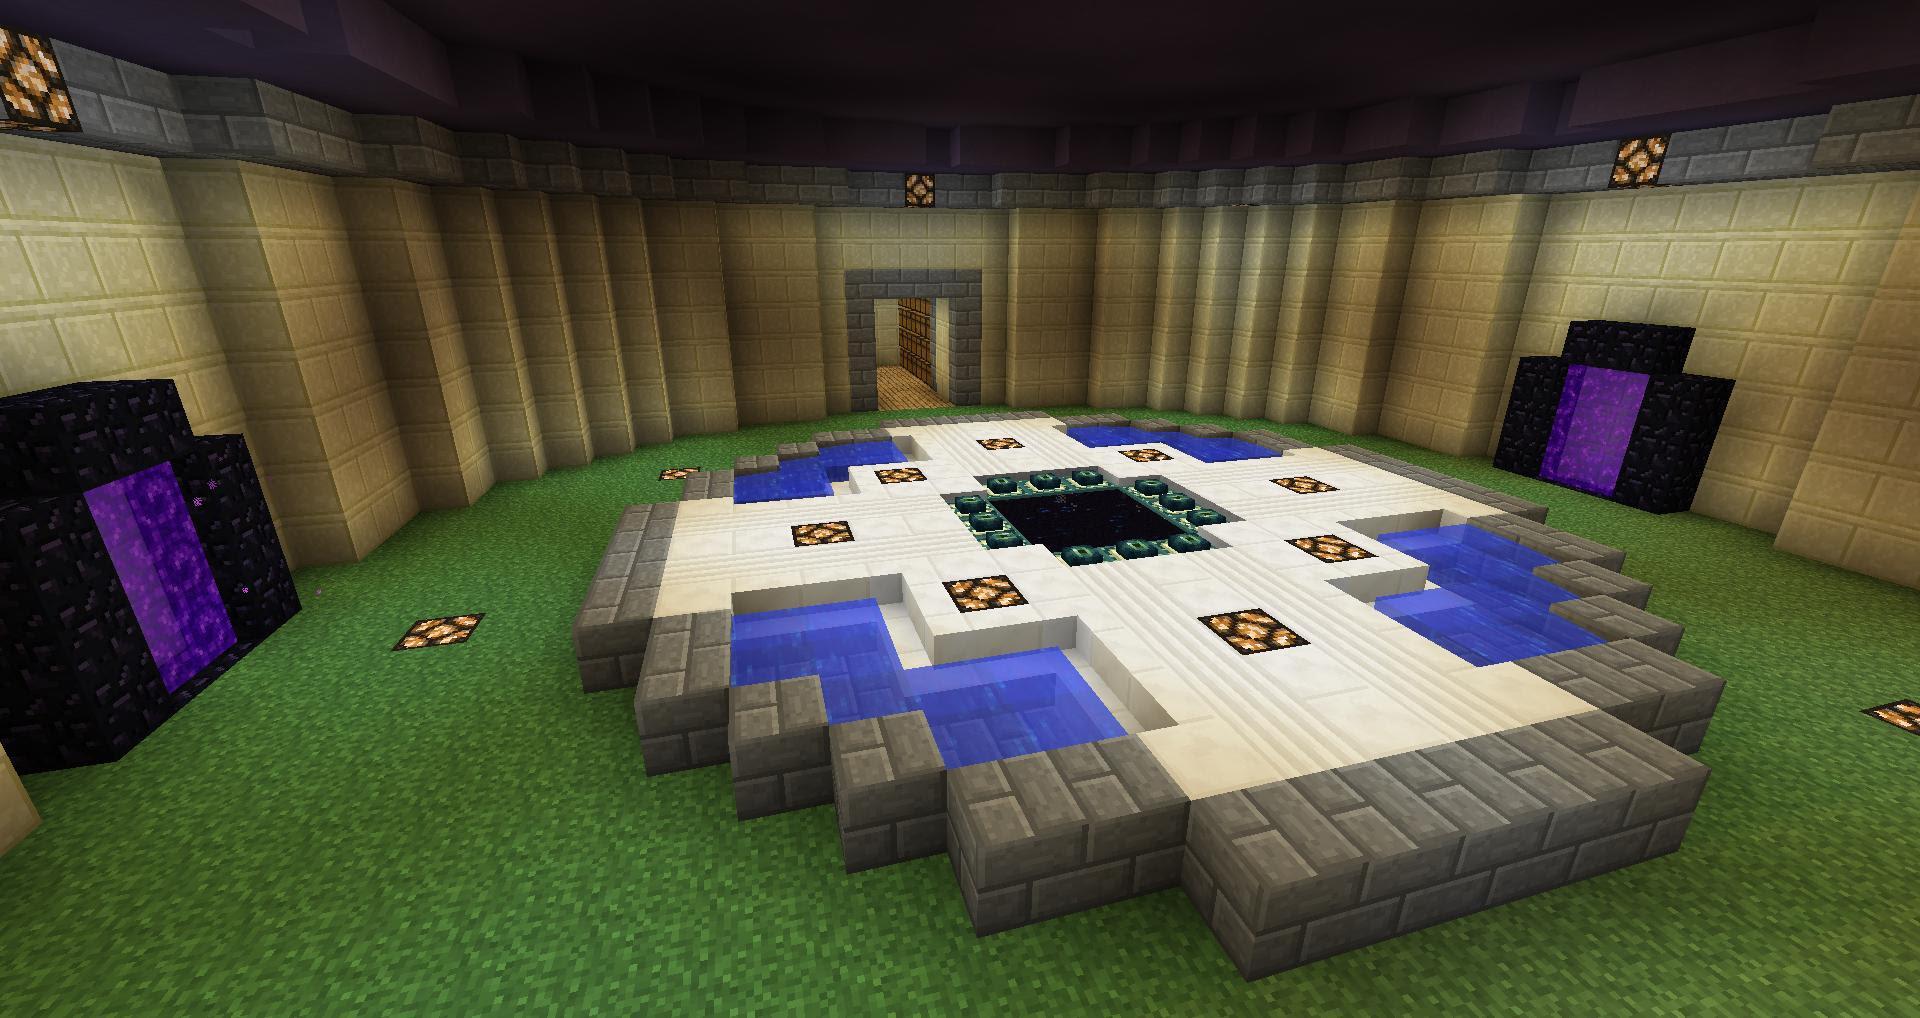 End Portal Room : Minecraft